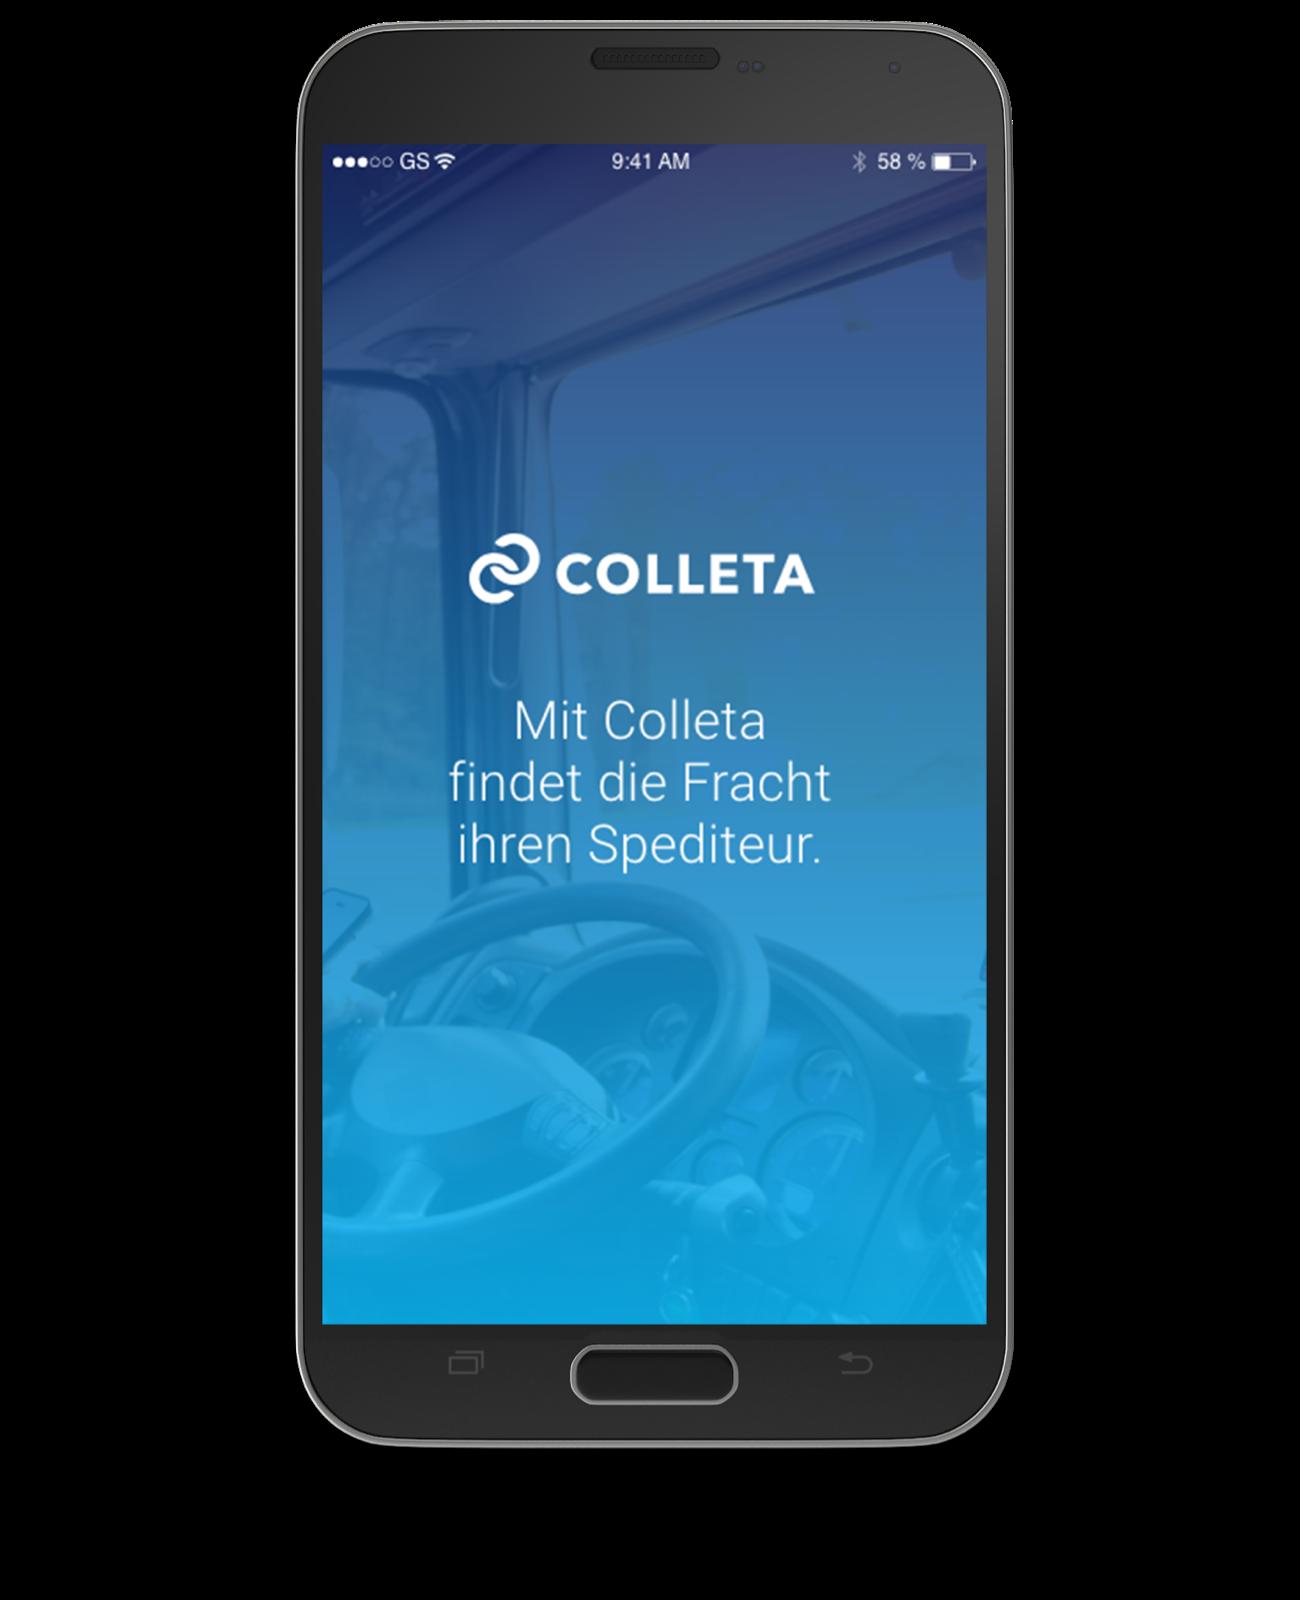 colleta-apple-ios-app.png